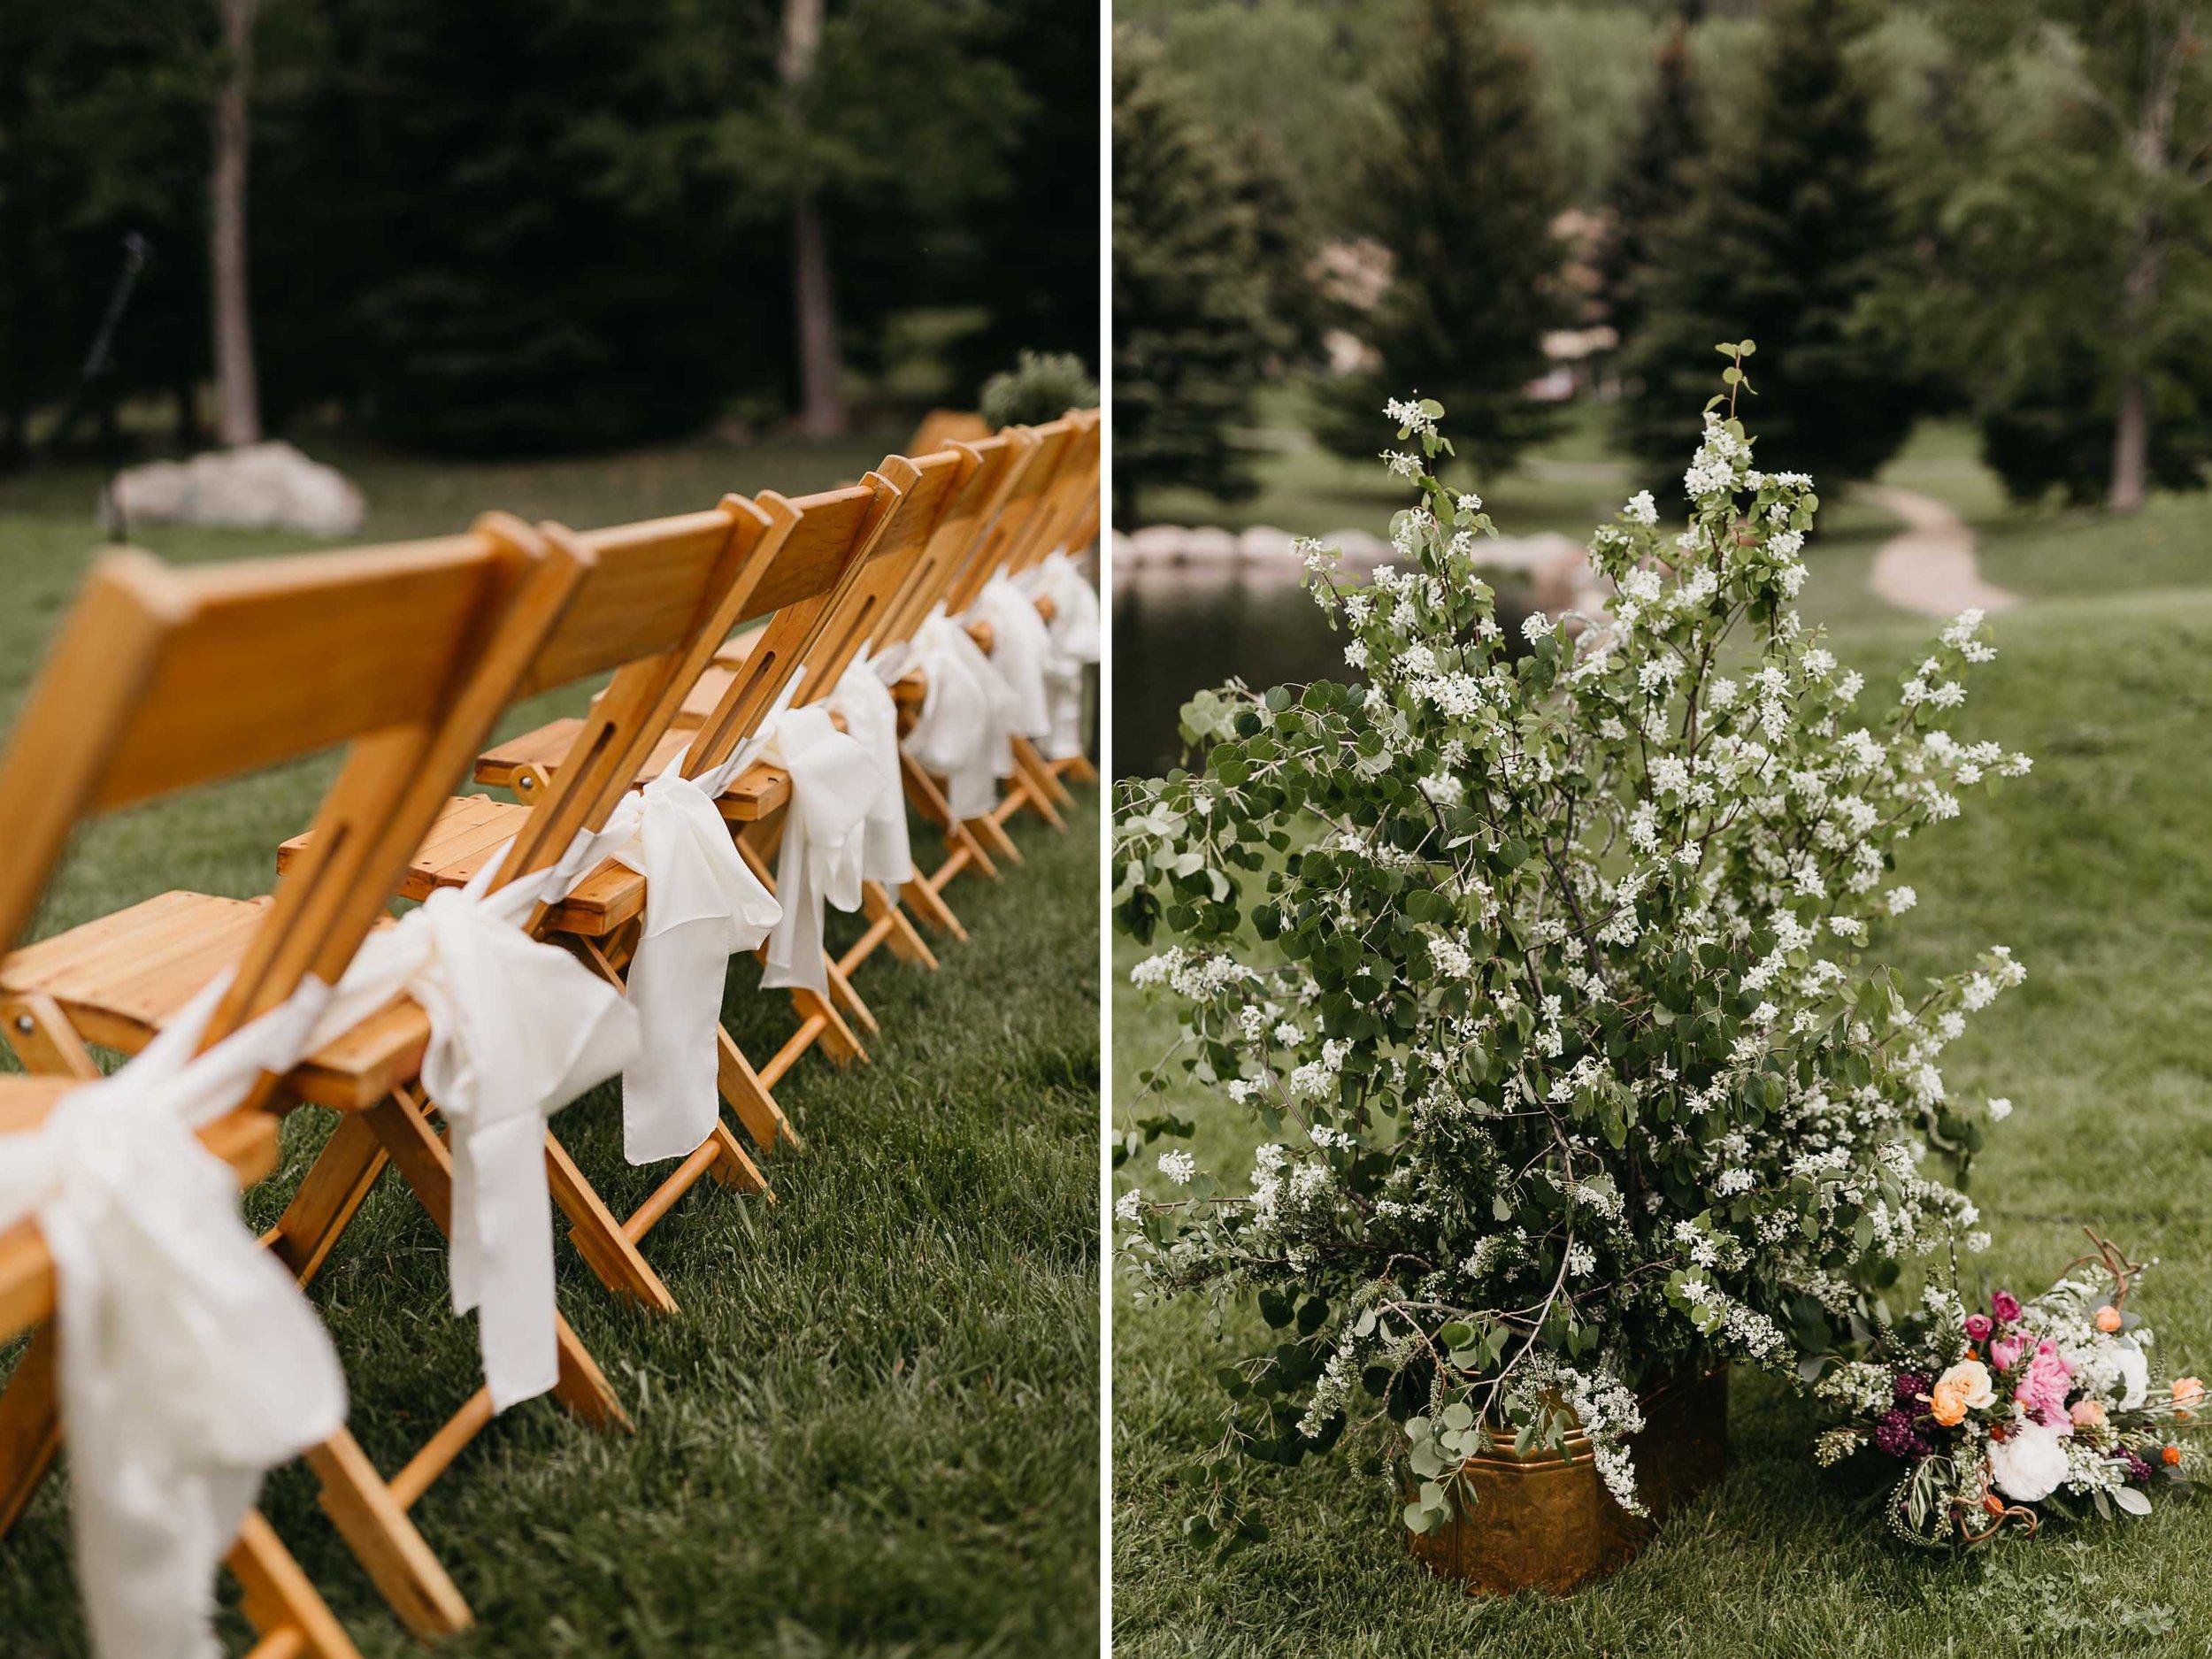 Colorado-Wedding-Photographer-45.jpg